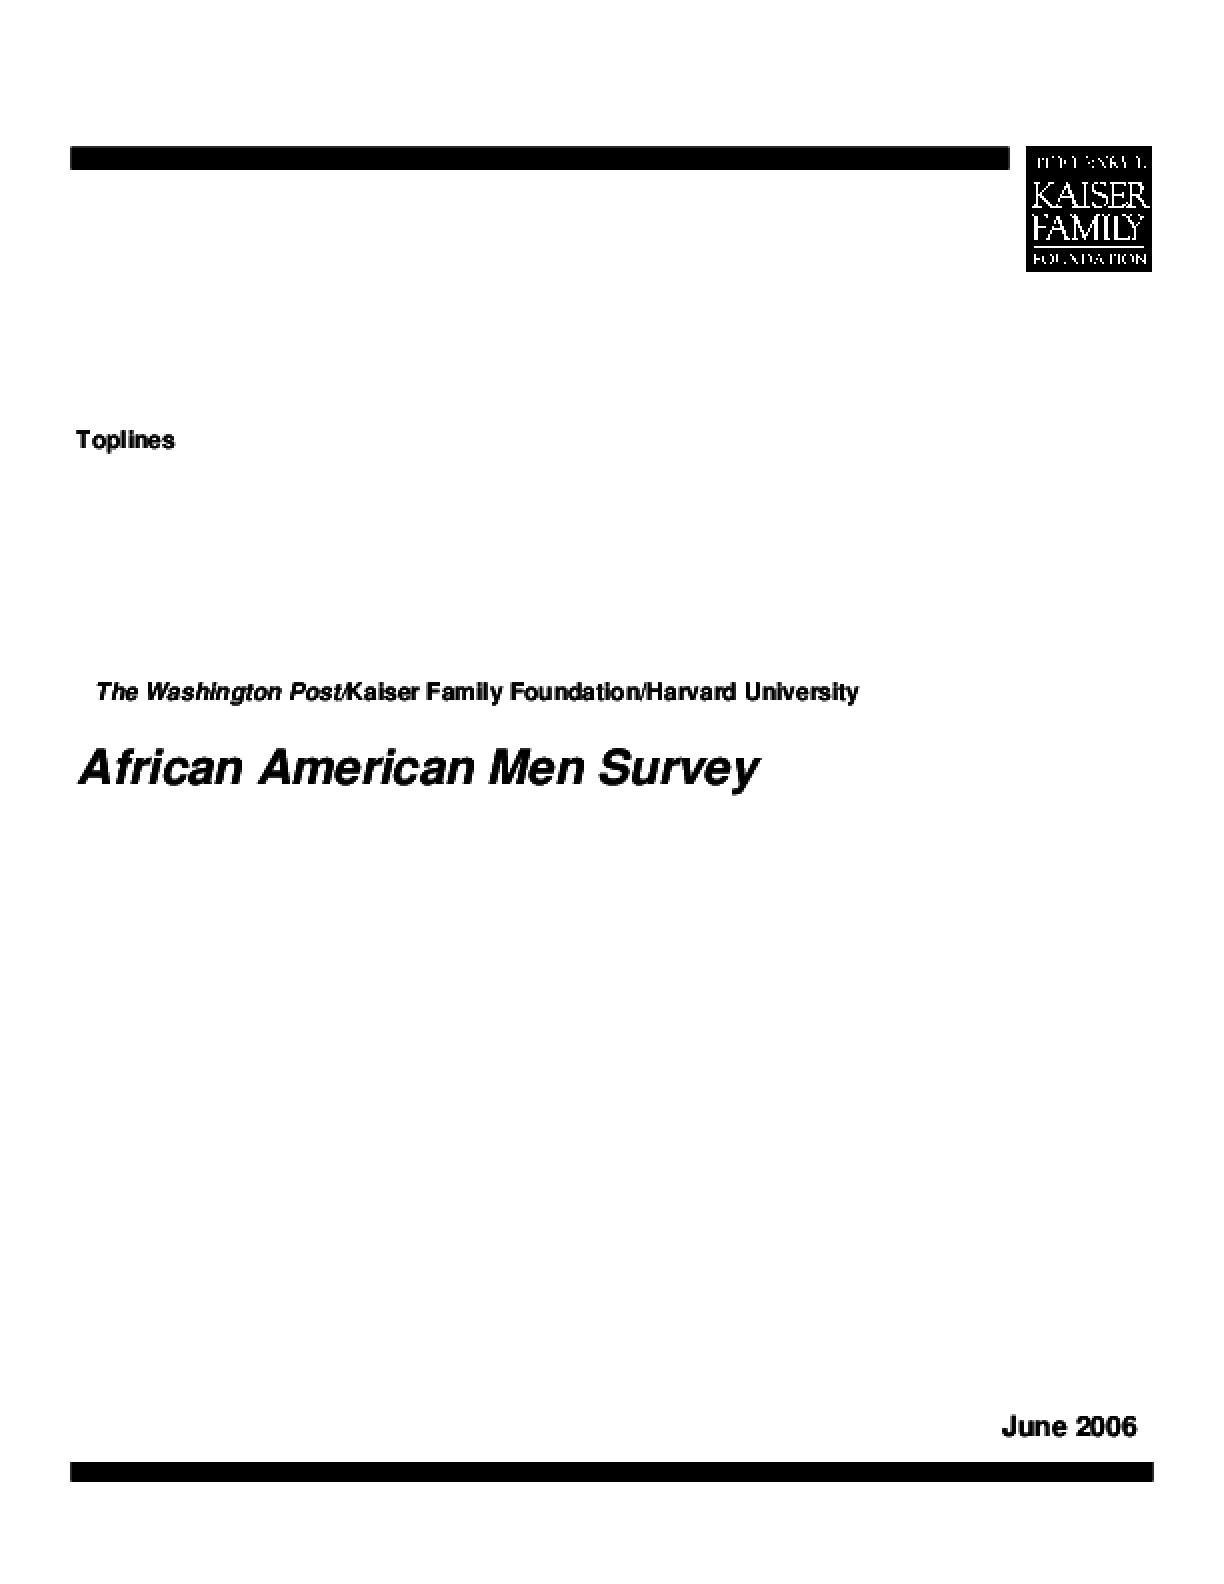 African American Men Survey